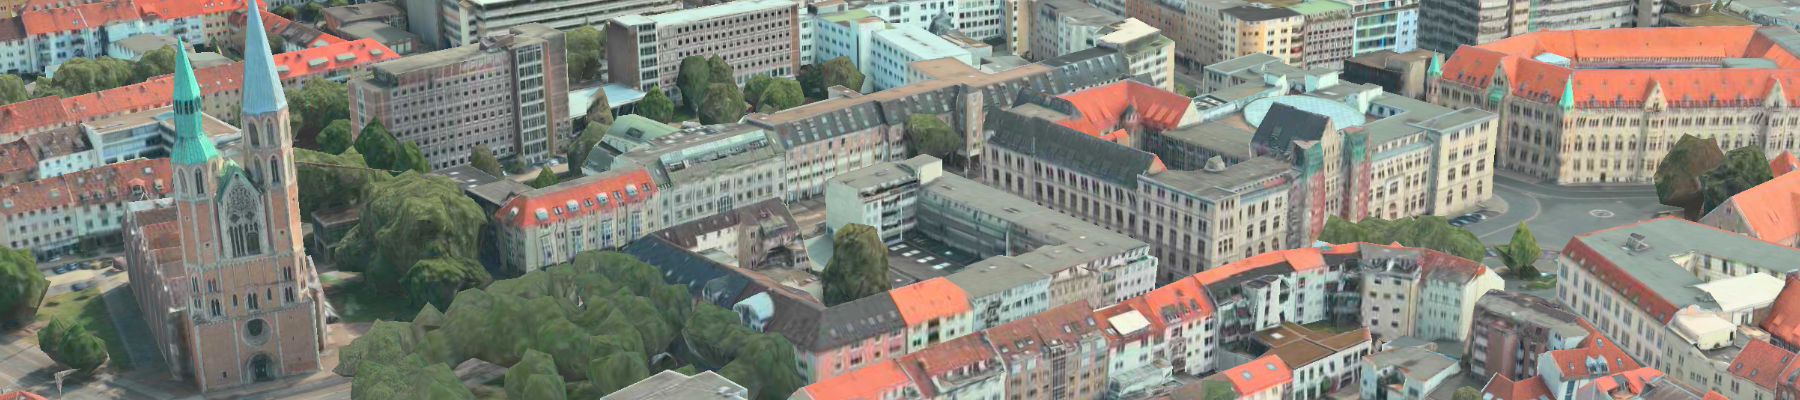 krebsberatung-bs.de